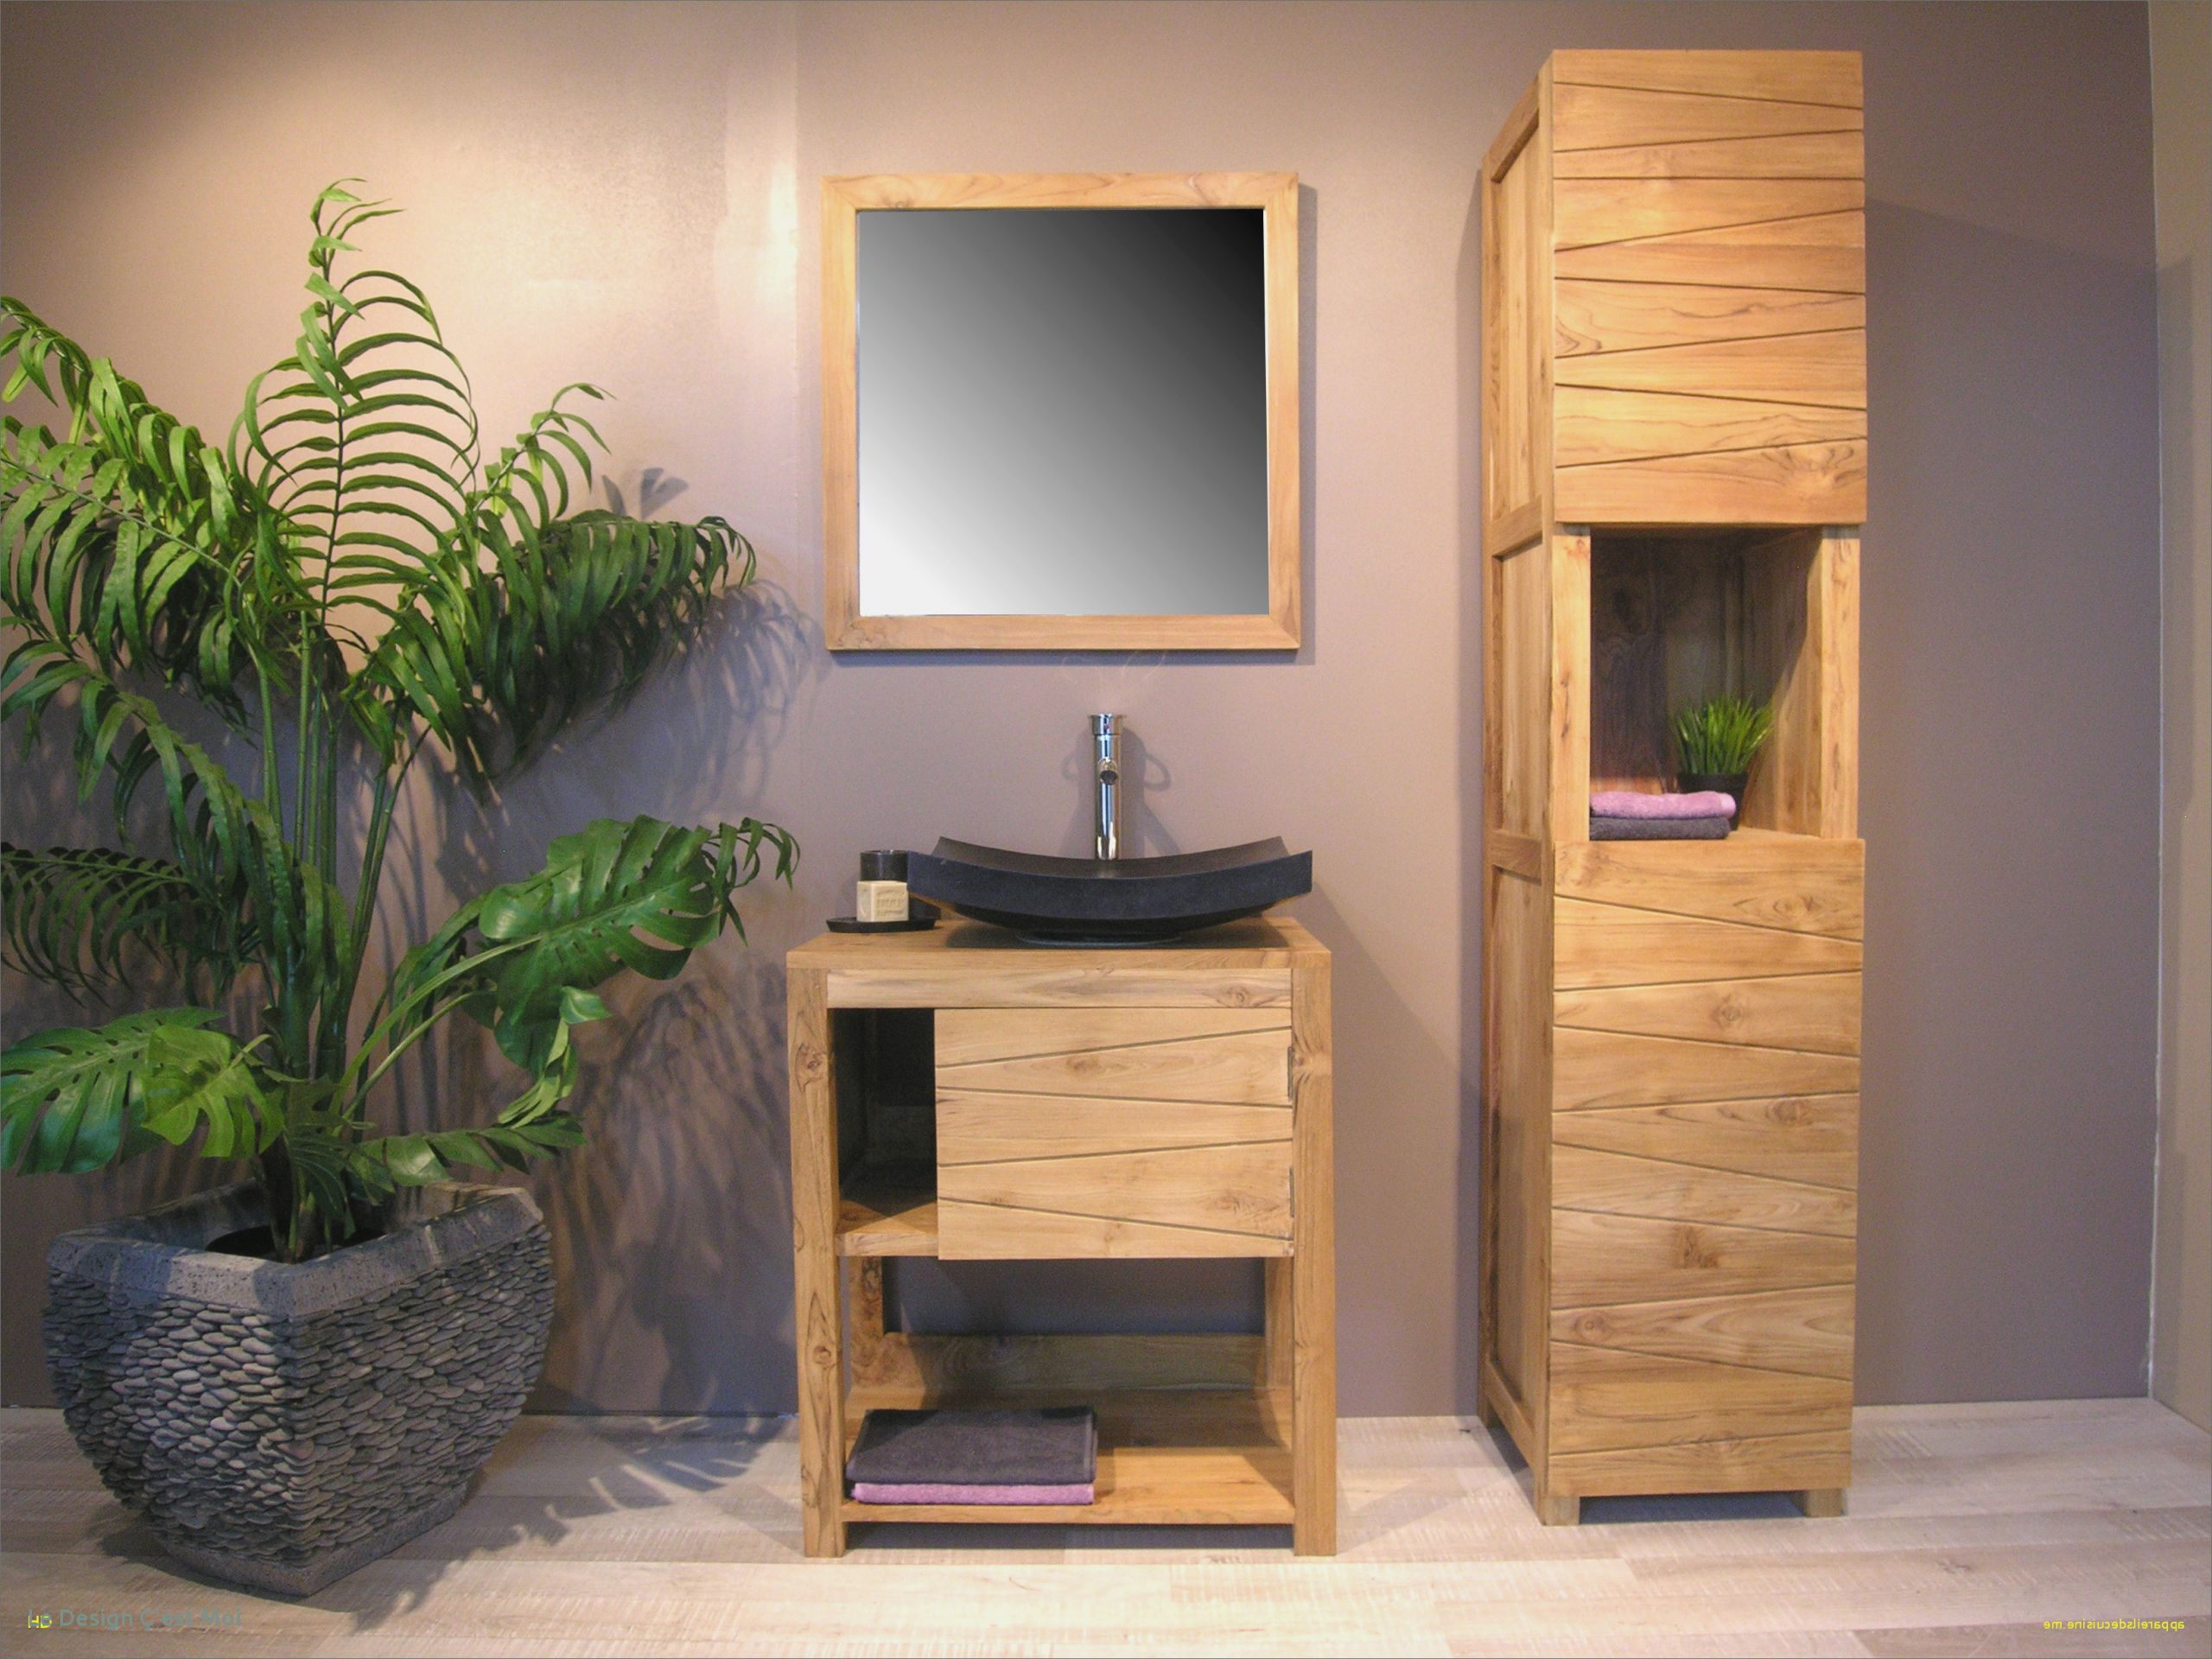 meuble pour salon meuble pour salon meubles besta meuble blanc 0d genial of meuble pour salon